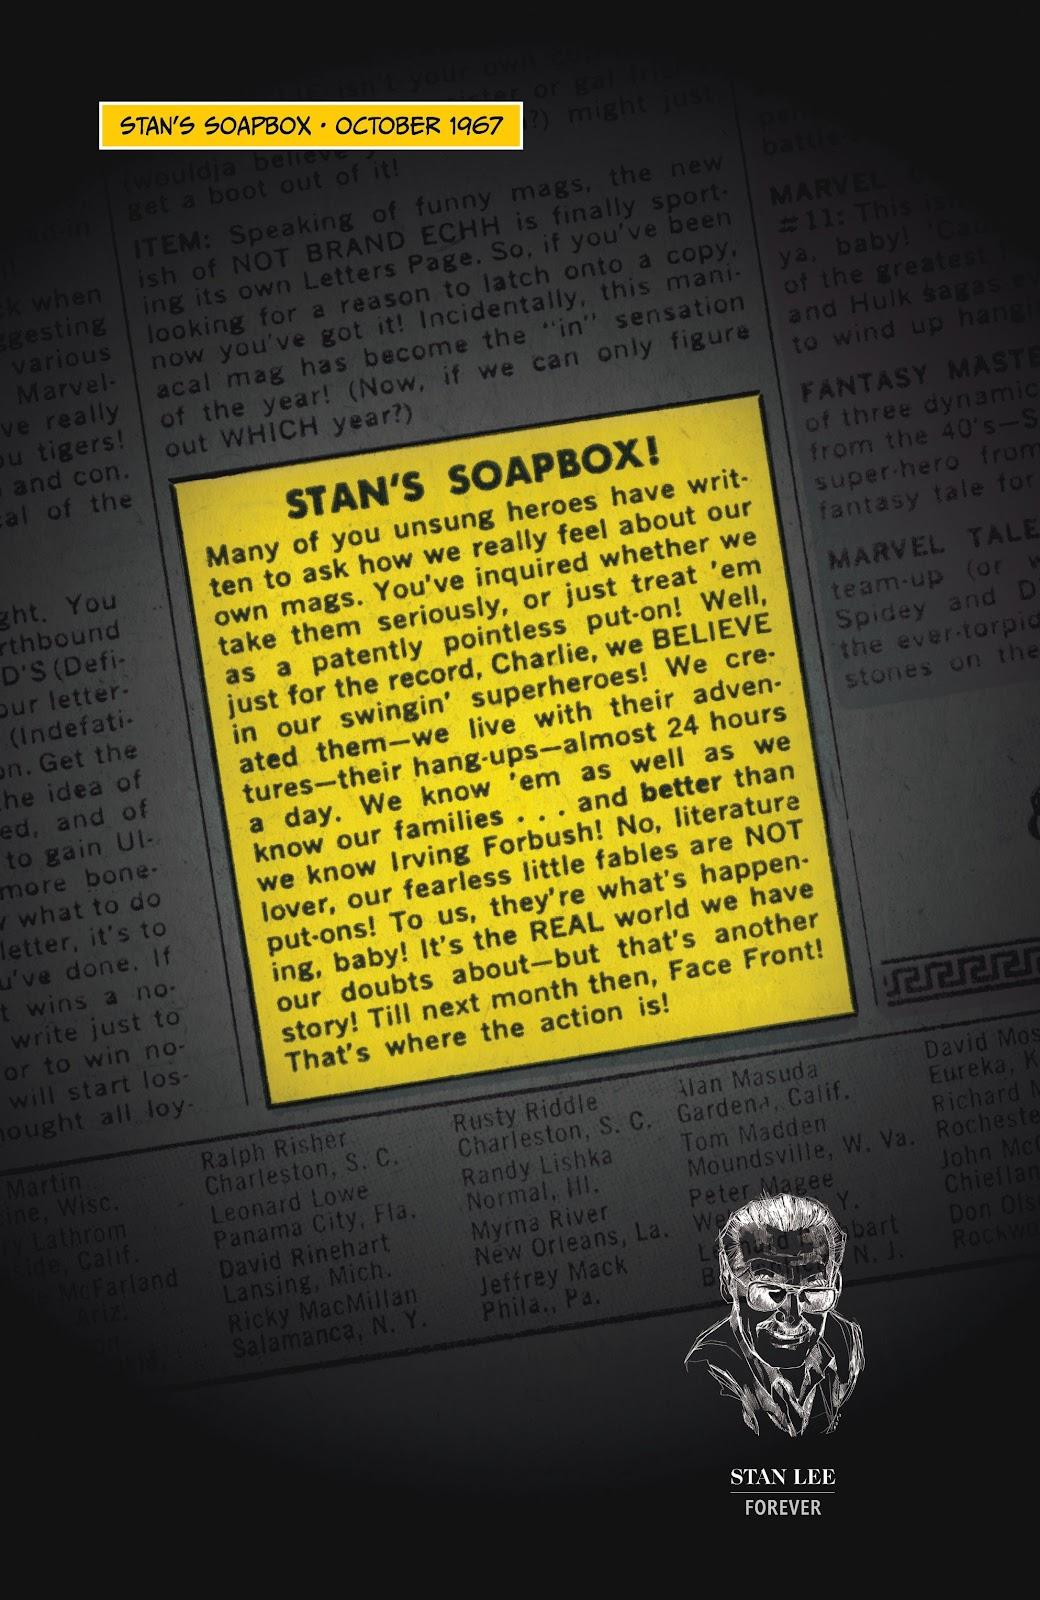 Read online Spider-Man/Deadpool comic -  Issue #49 - 18